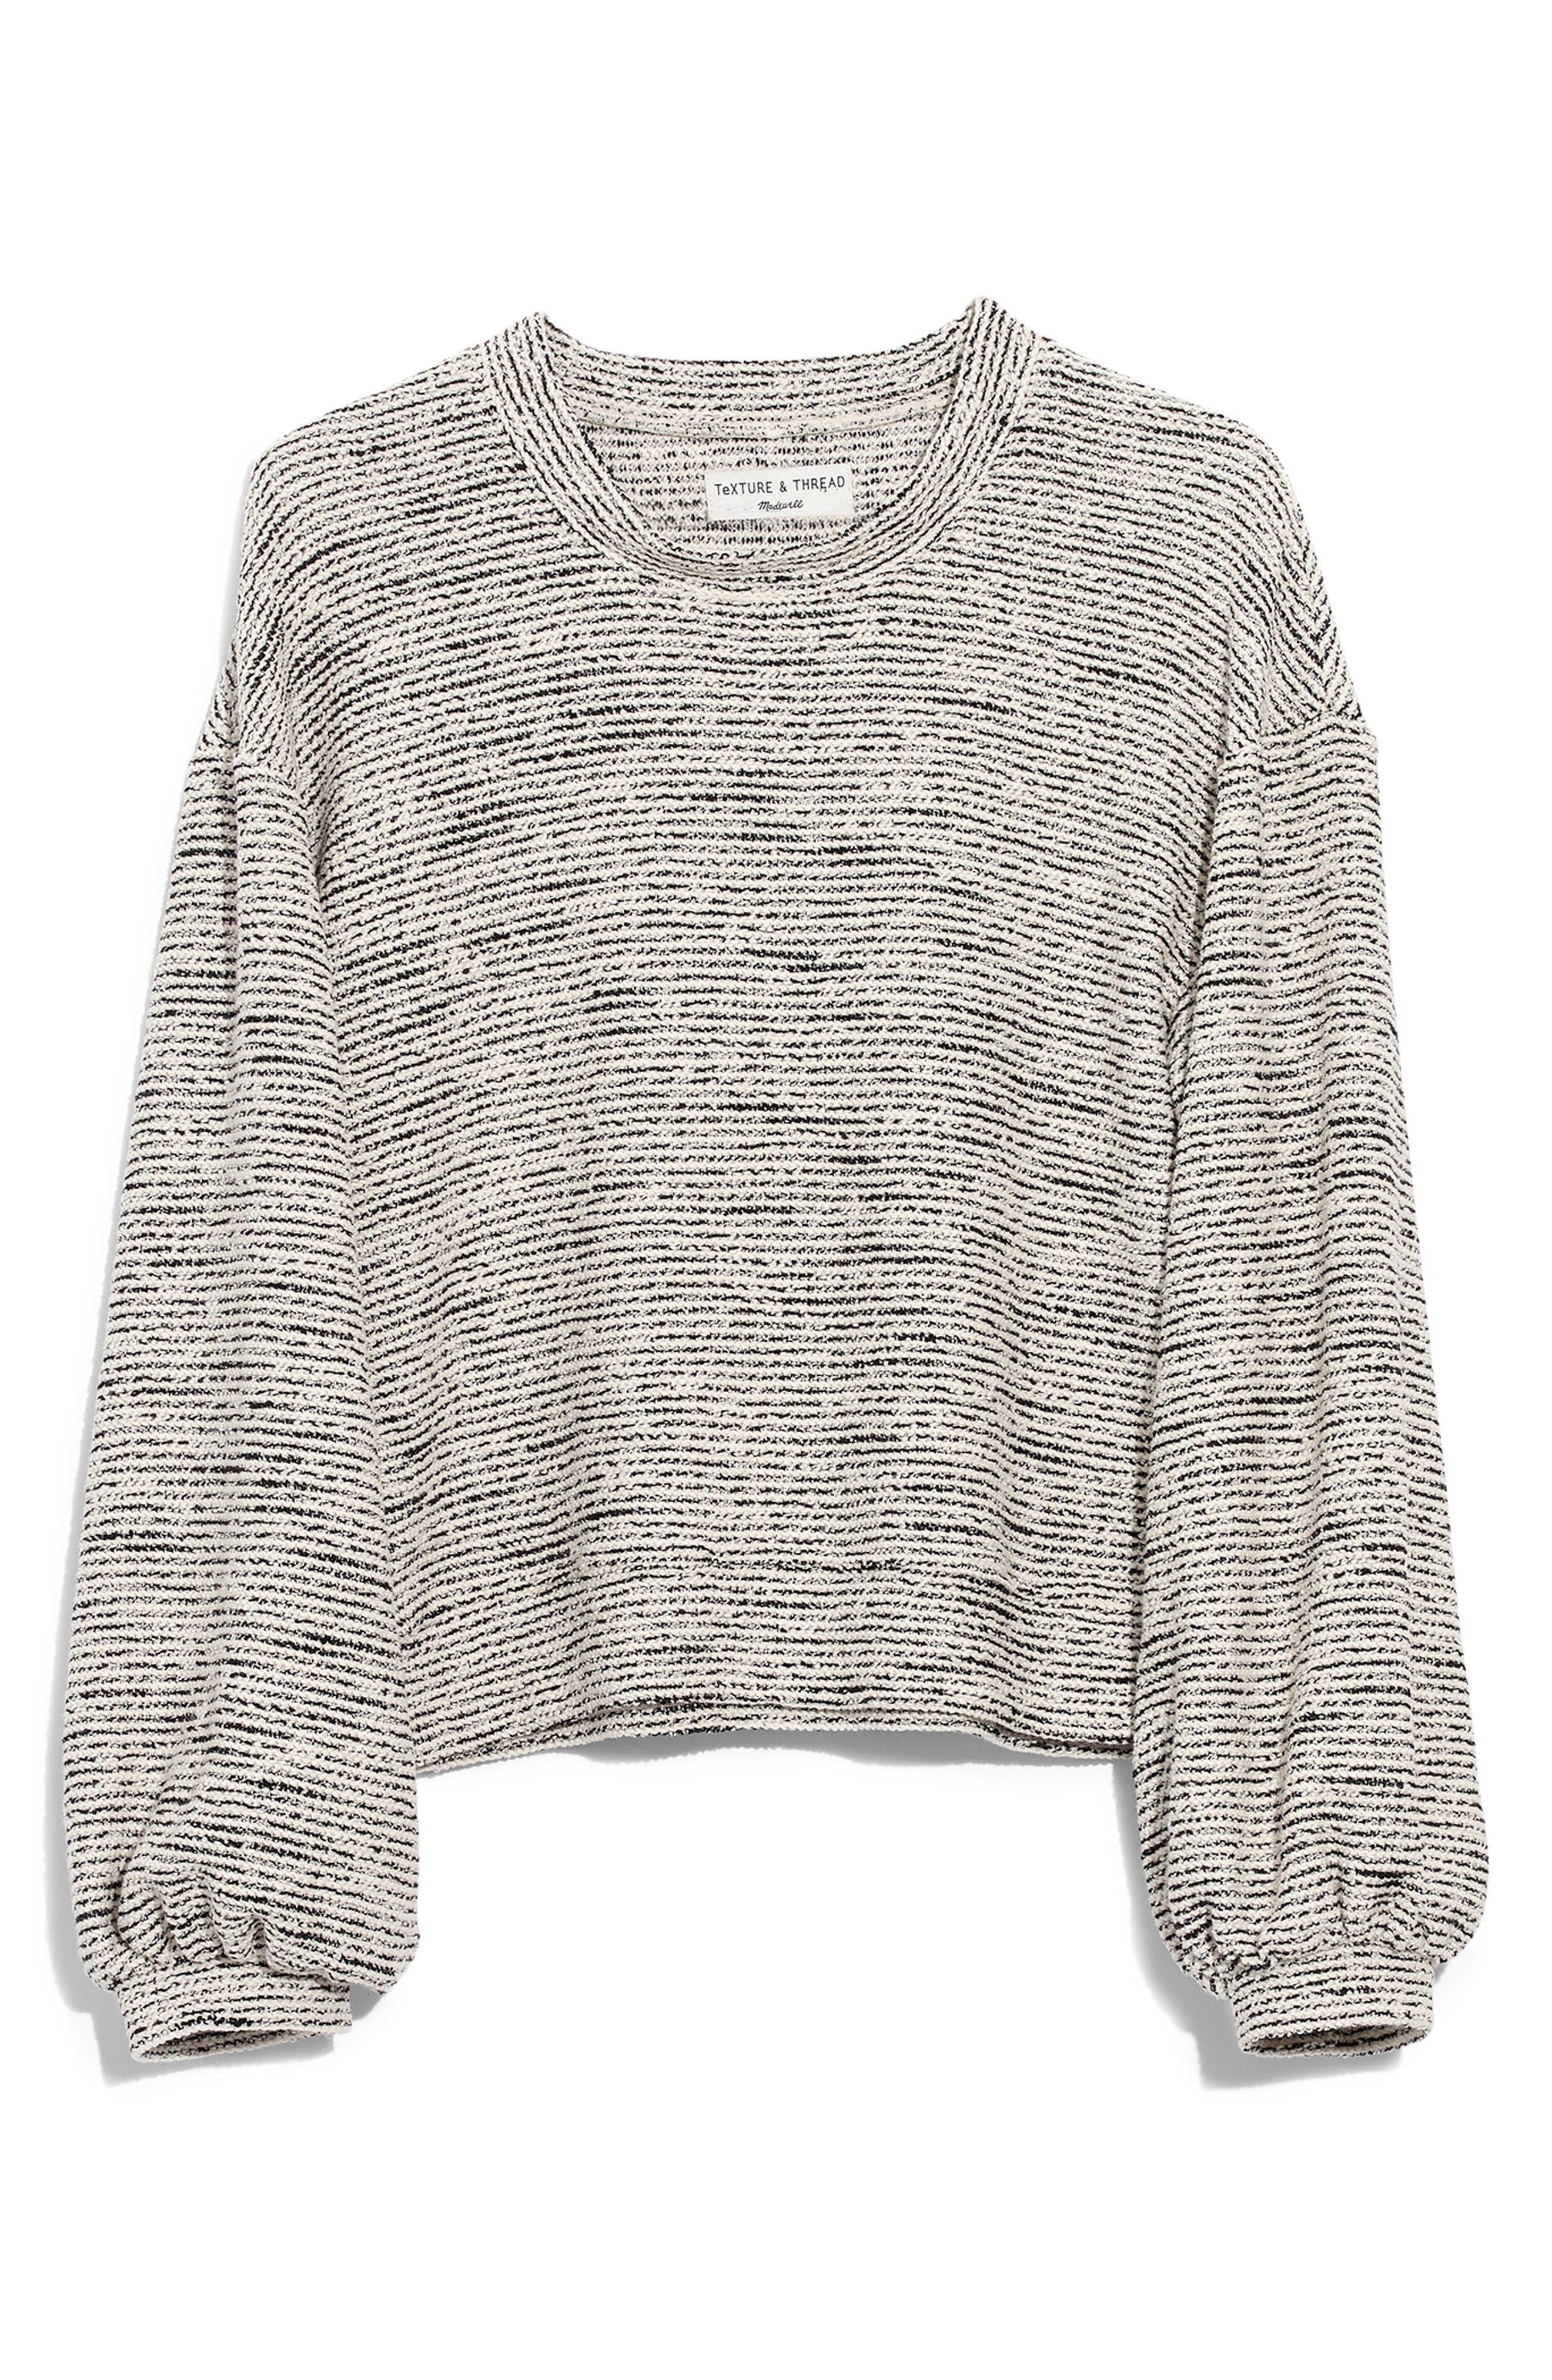 MADEWELL, Texture & Thread Bubble Sleeve Sweatshirt, Alternate thumbnail 4, color, HEATHER GREY